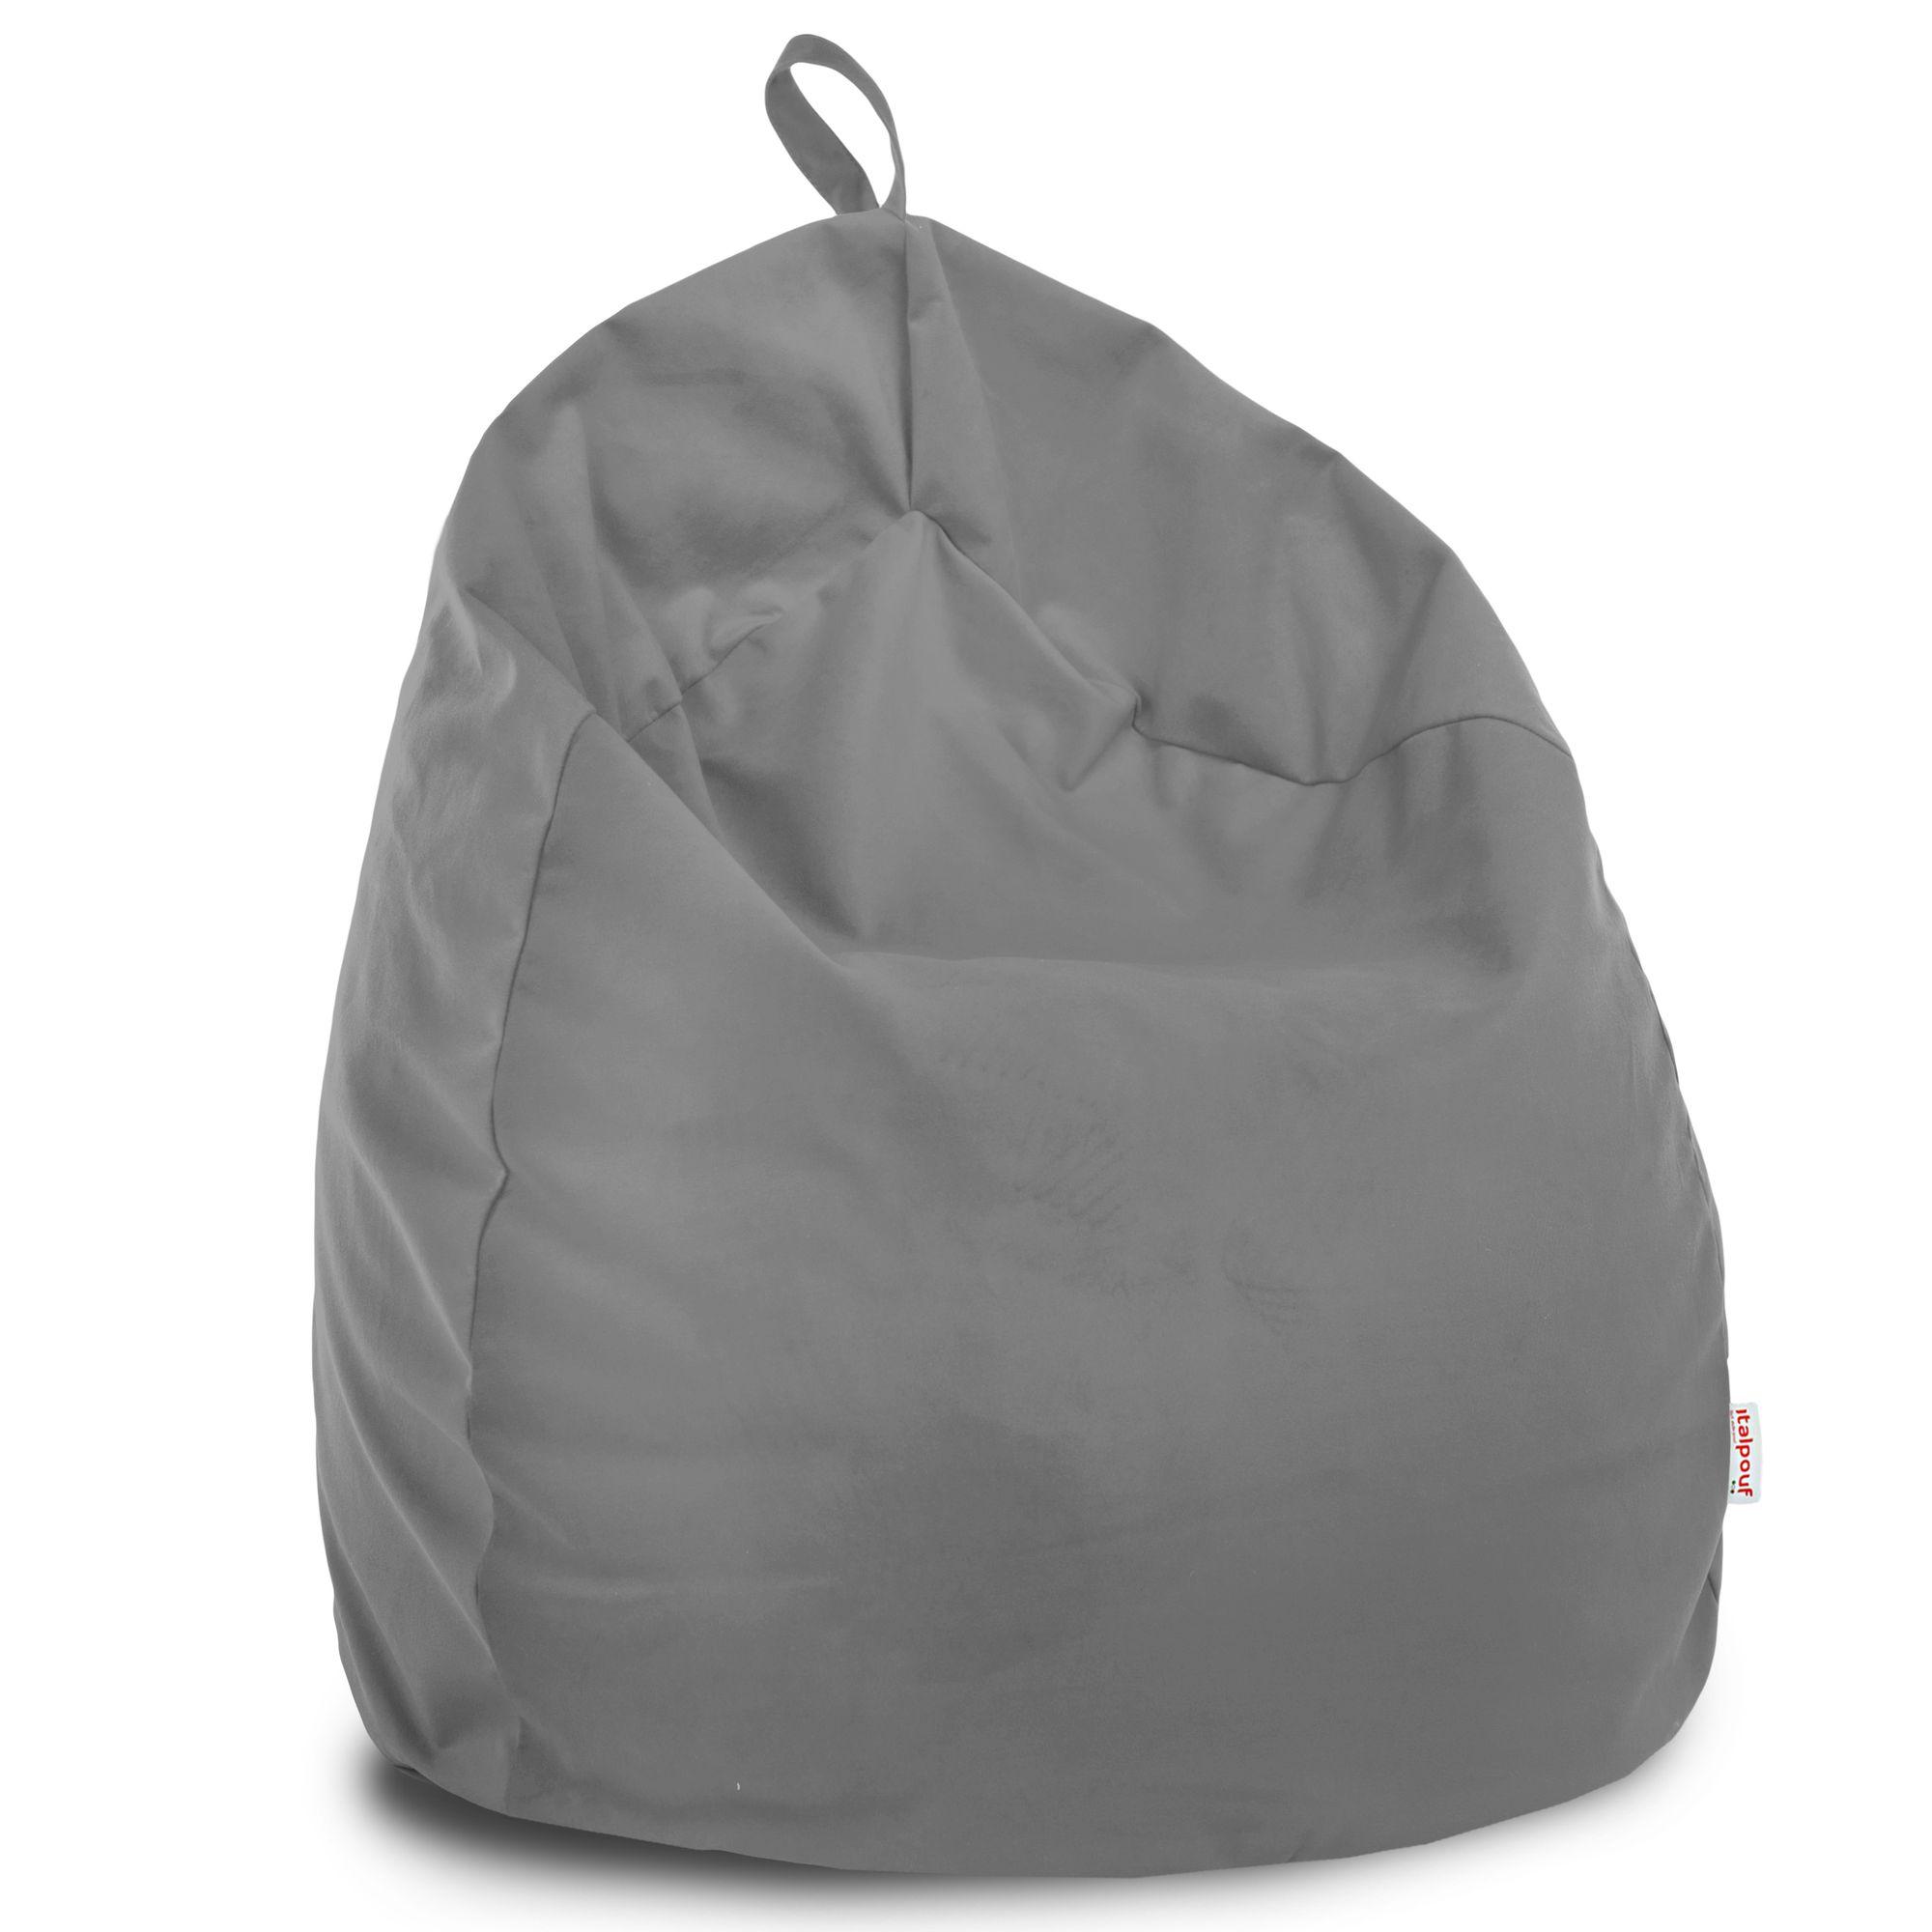 Poltrona sacco moderna per bambini pouf sacco pera gufo for Poltrona bambini